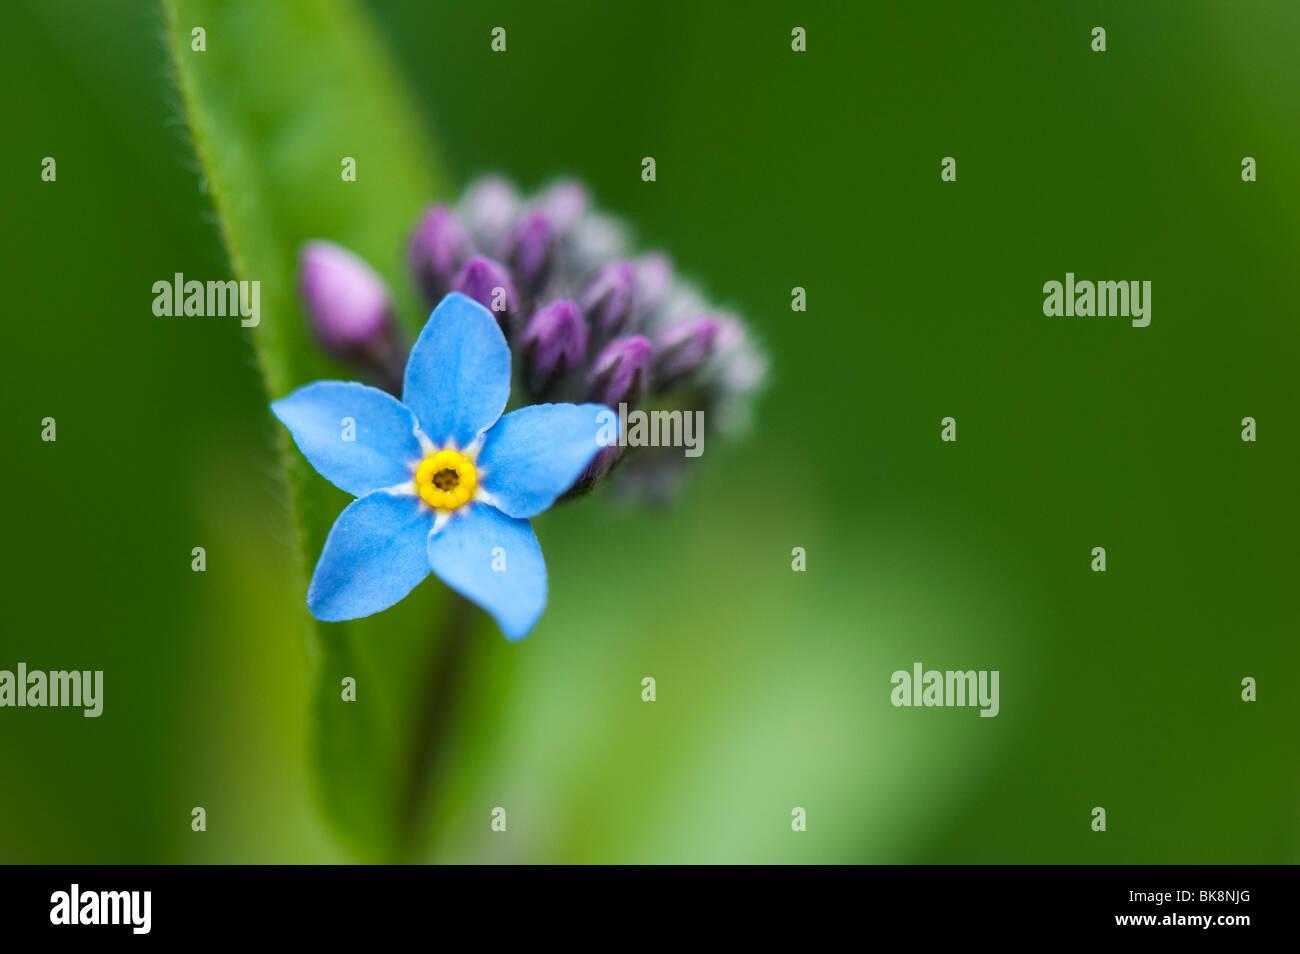 Myosotis sylvatica. Forget-me-not flower Stock Photo